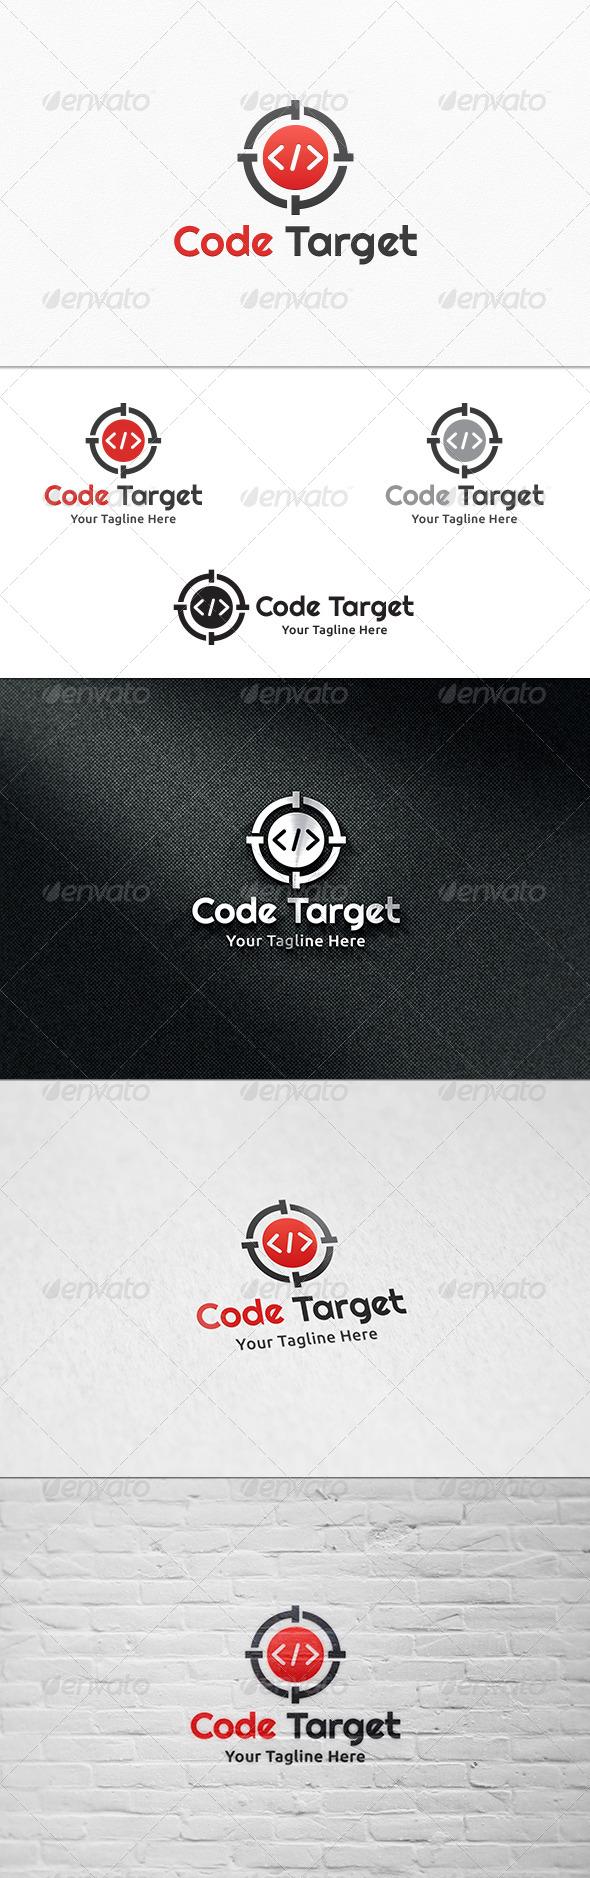 GraphicRiver Code Target V2 Logo Template 8164025